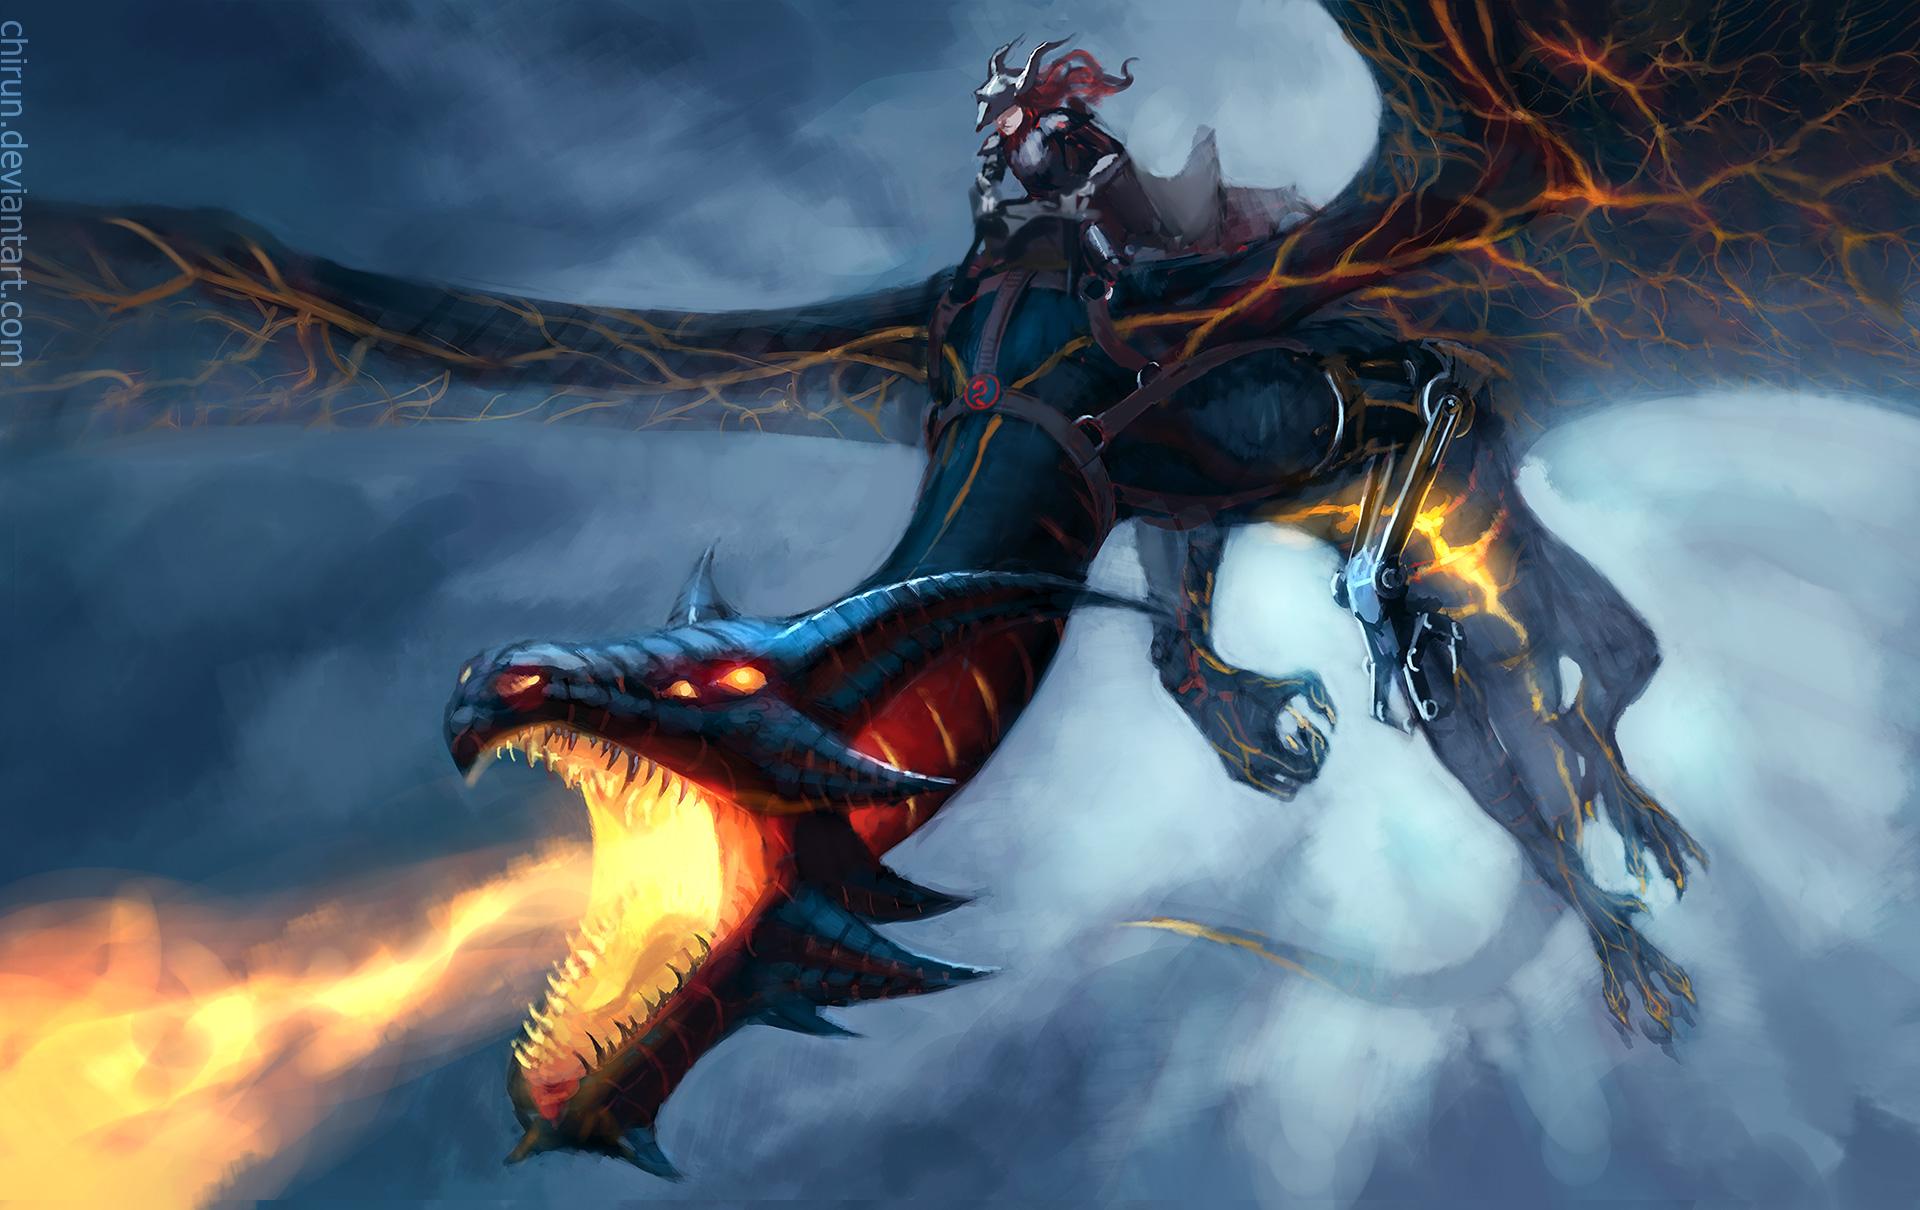 Dragon Rider Wallpaper Hd Artist 4k Wallpapers Images